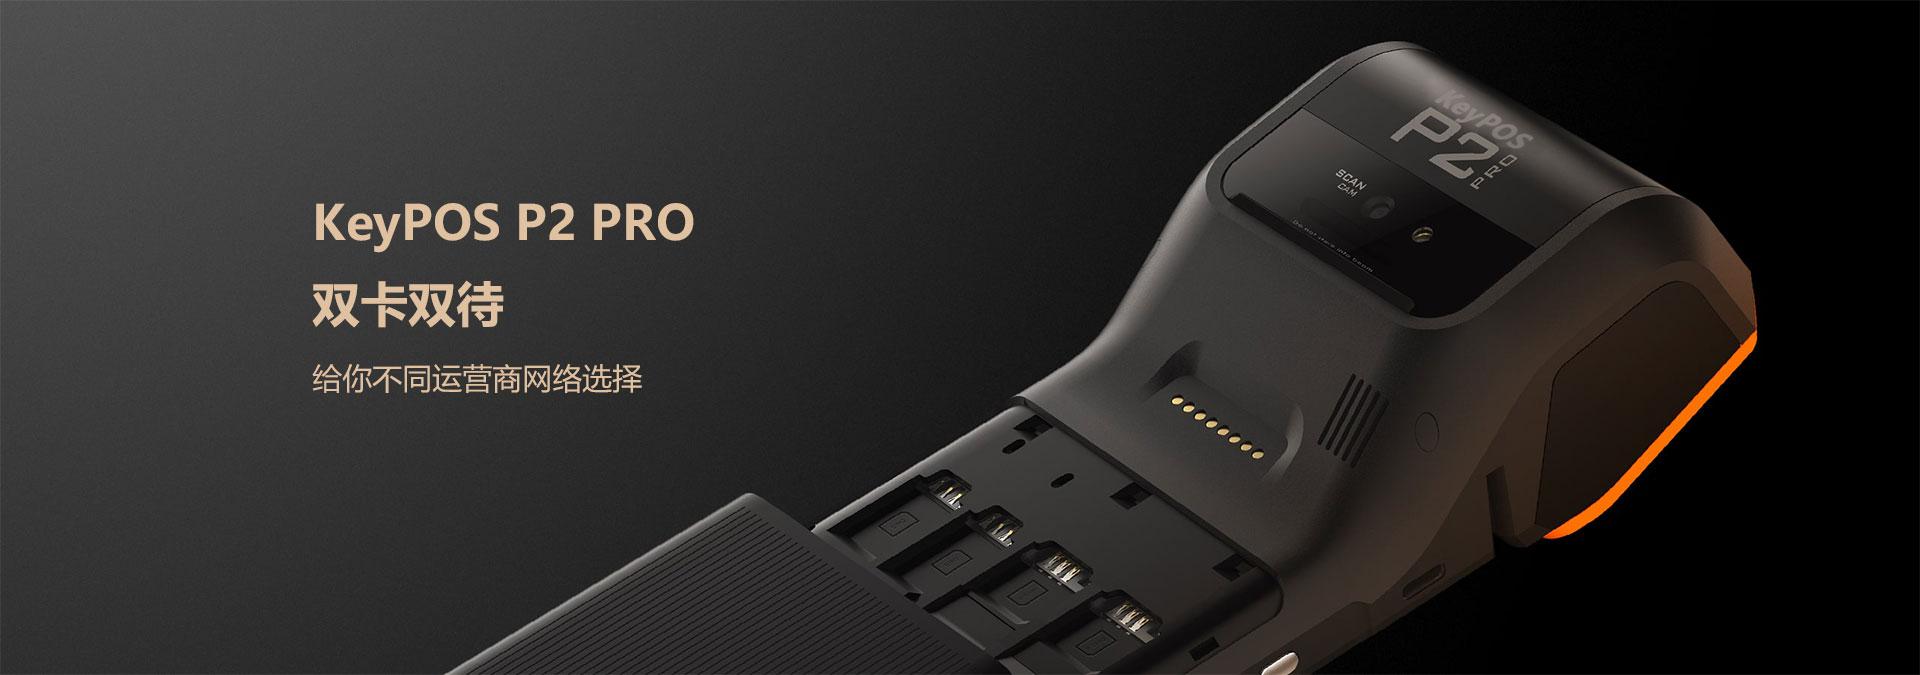 KeyPOS新一代POS机